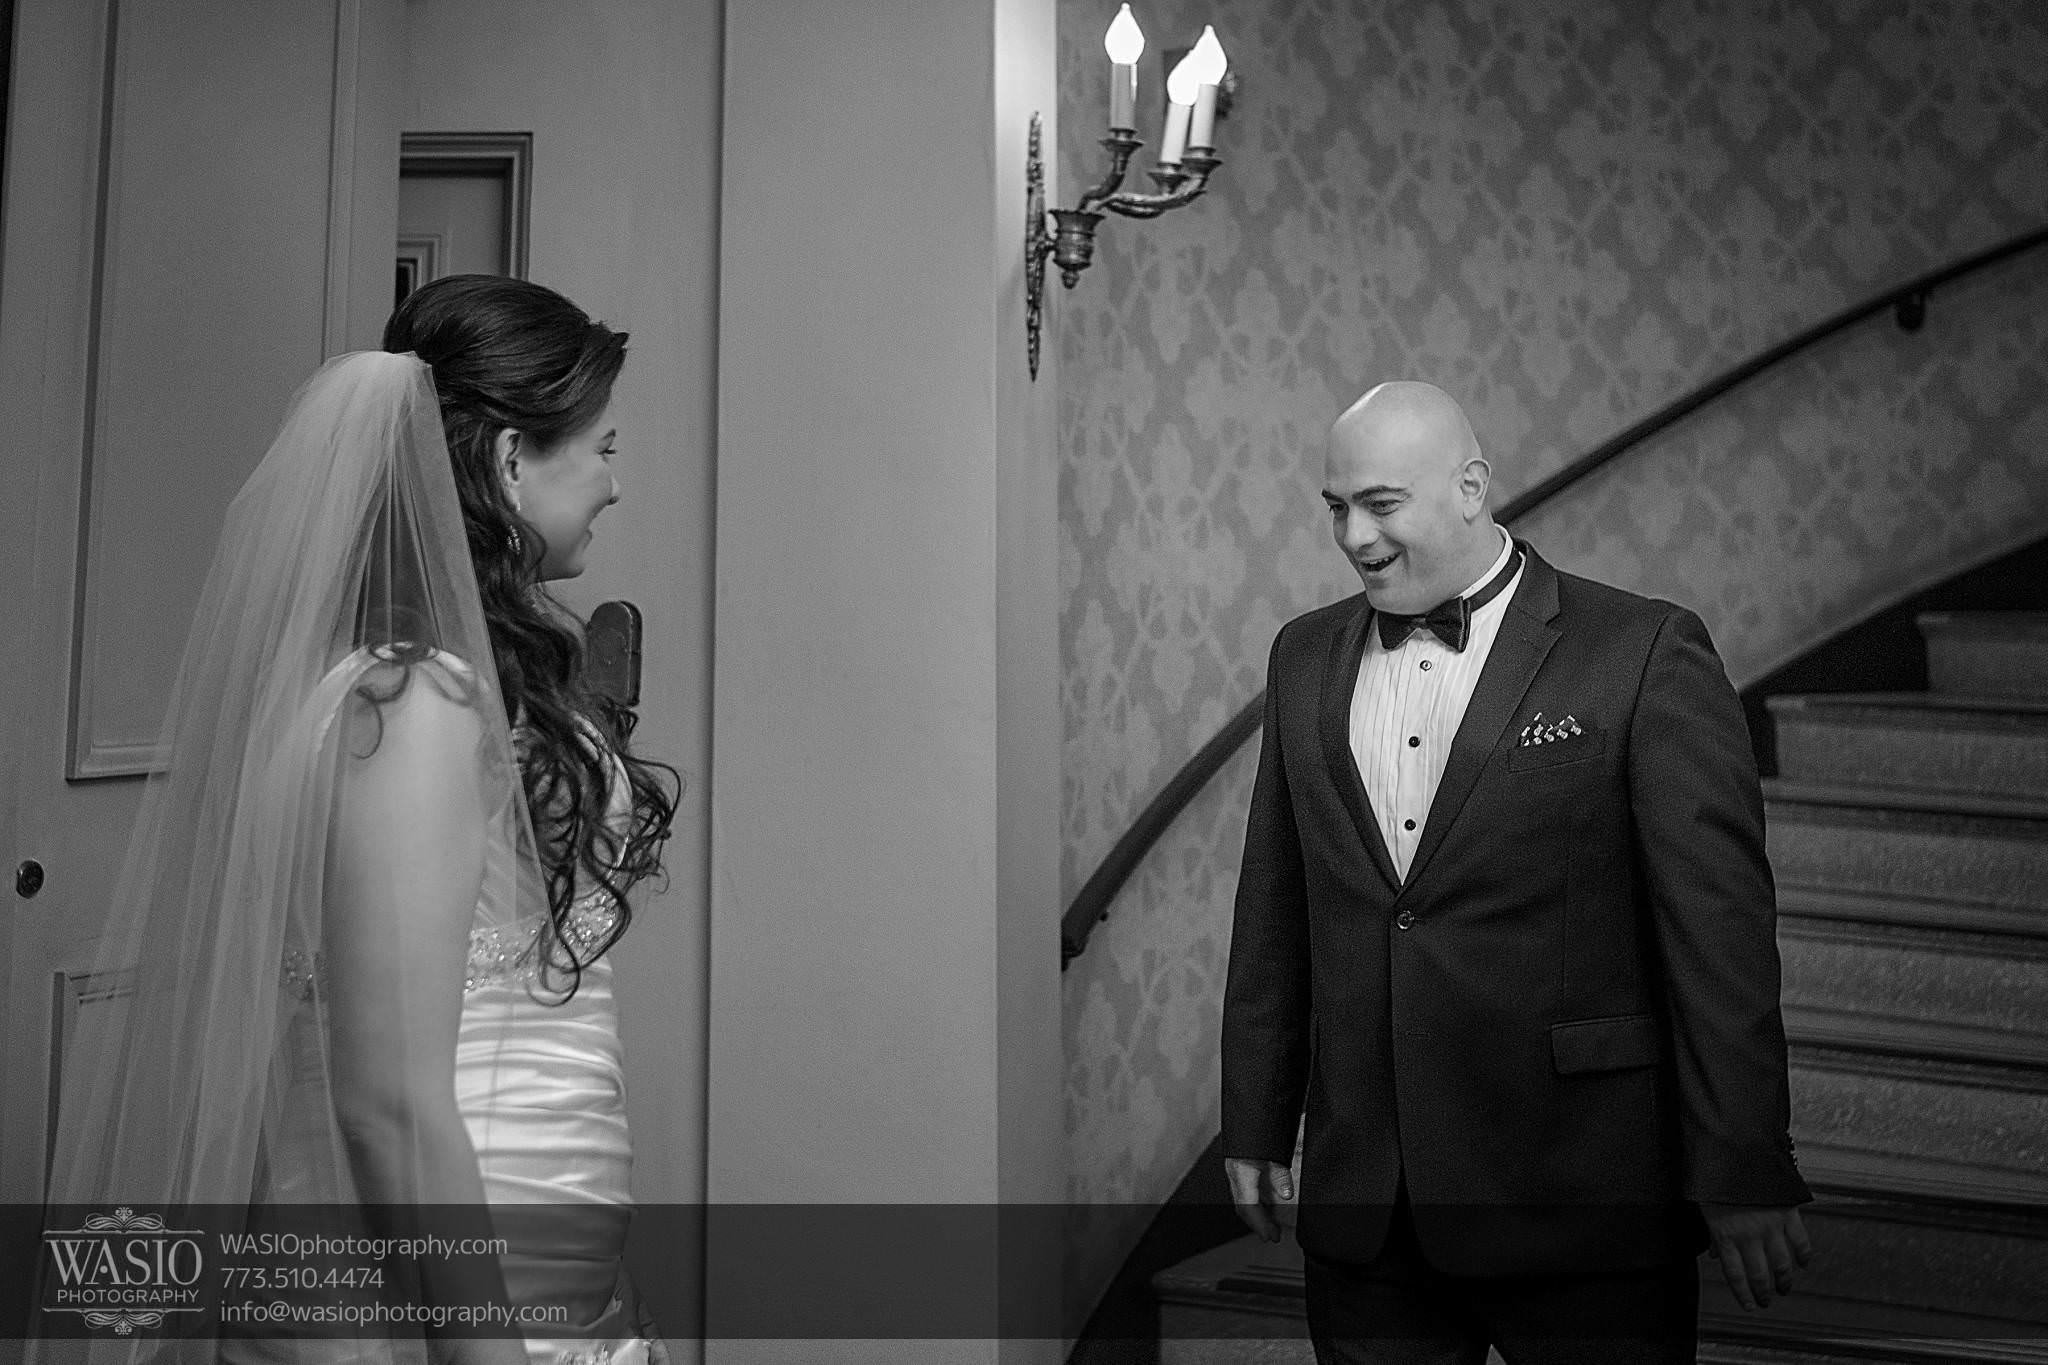 Chicago-wedding-photos-first-look-happy-groom-bride-surprise-029 Chicago Wedding Photos - Svetlana + Yuriy